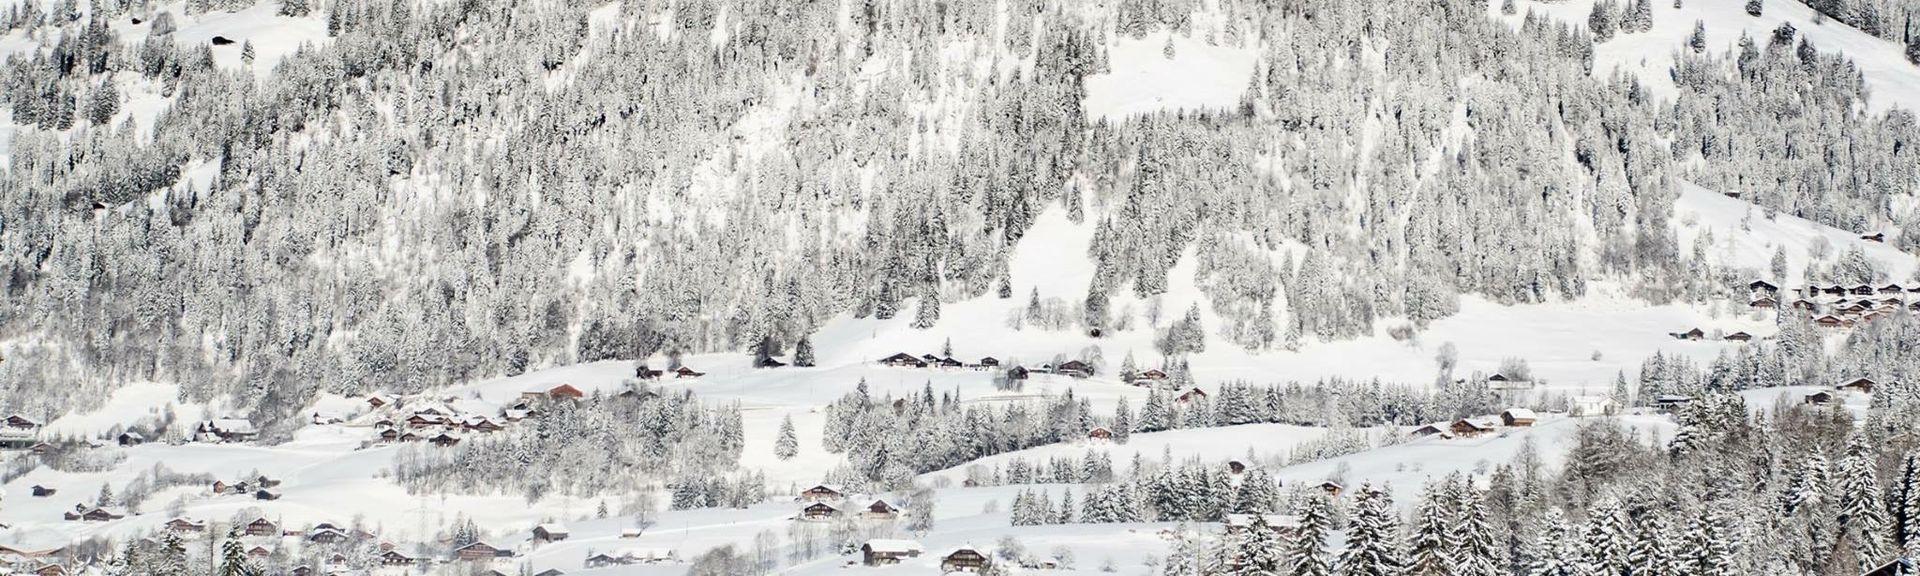 Lécherette, Switzerland